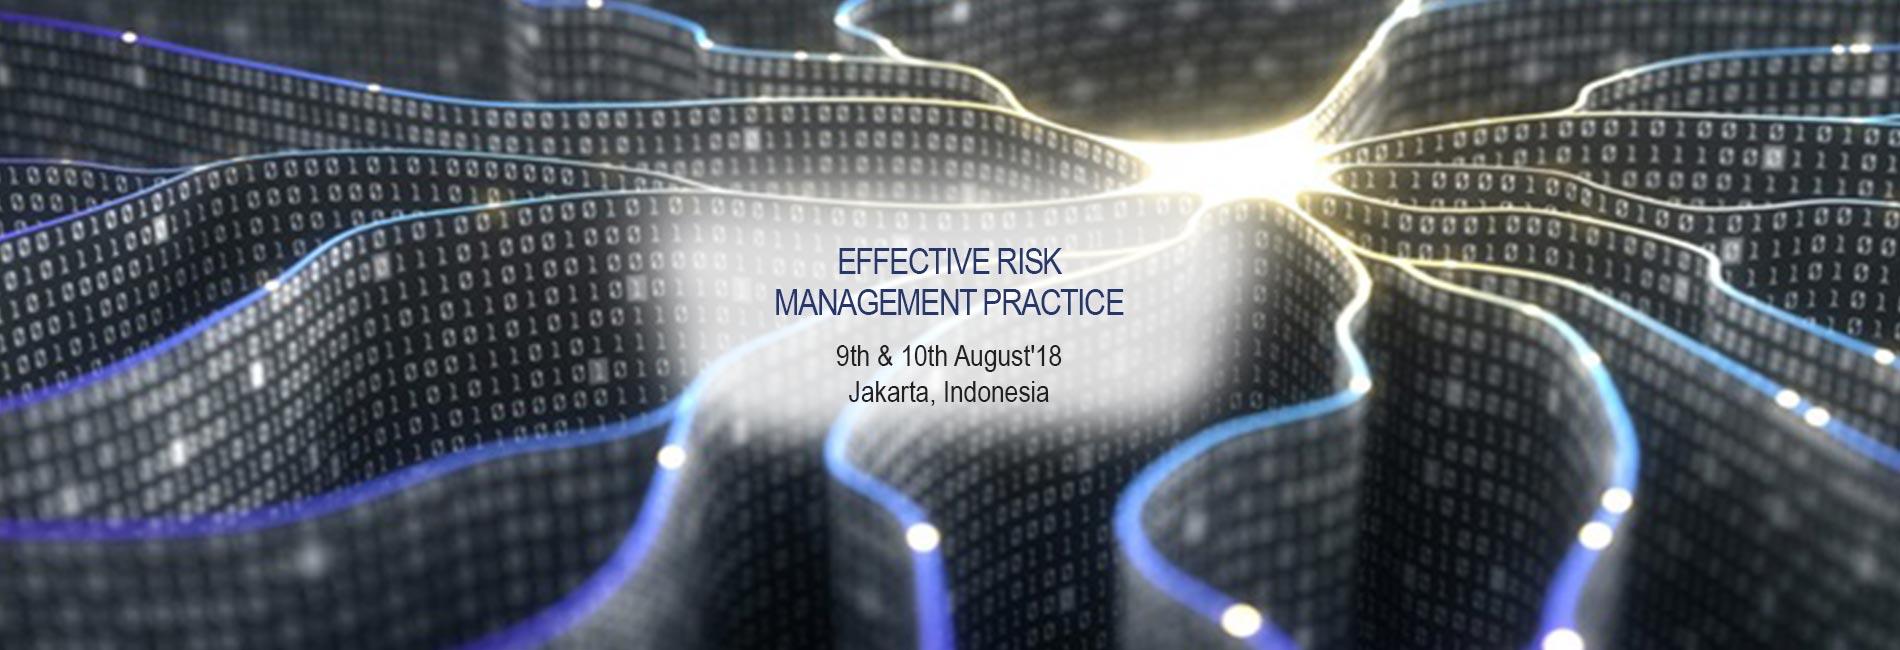 Effective Risk Management Practice